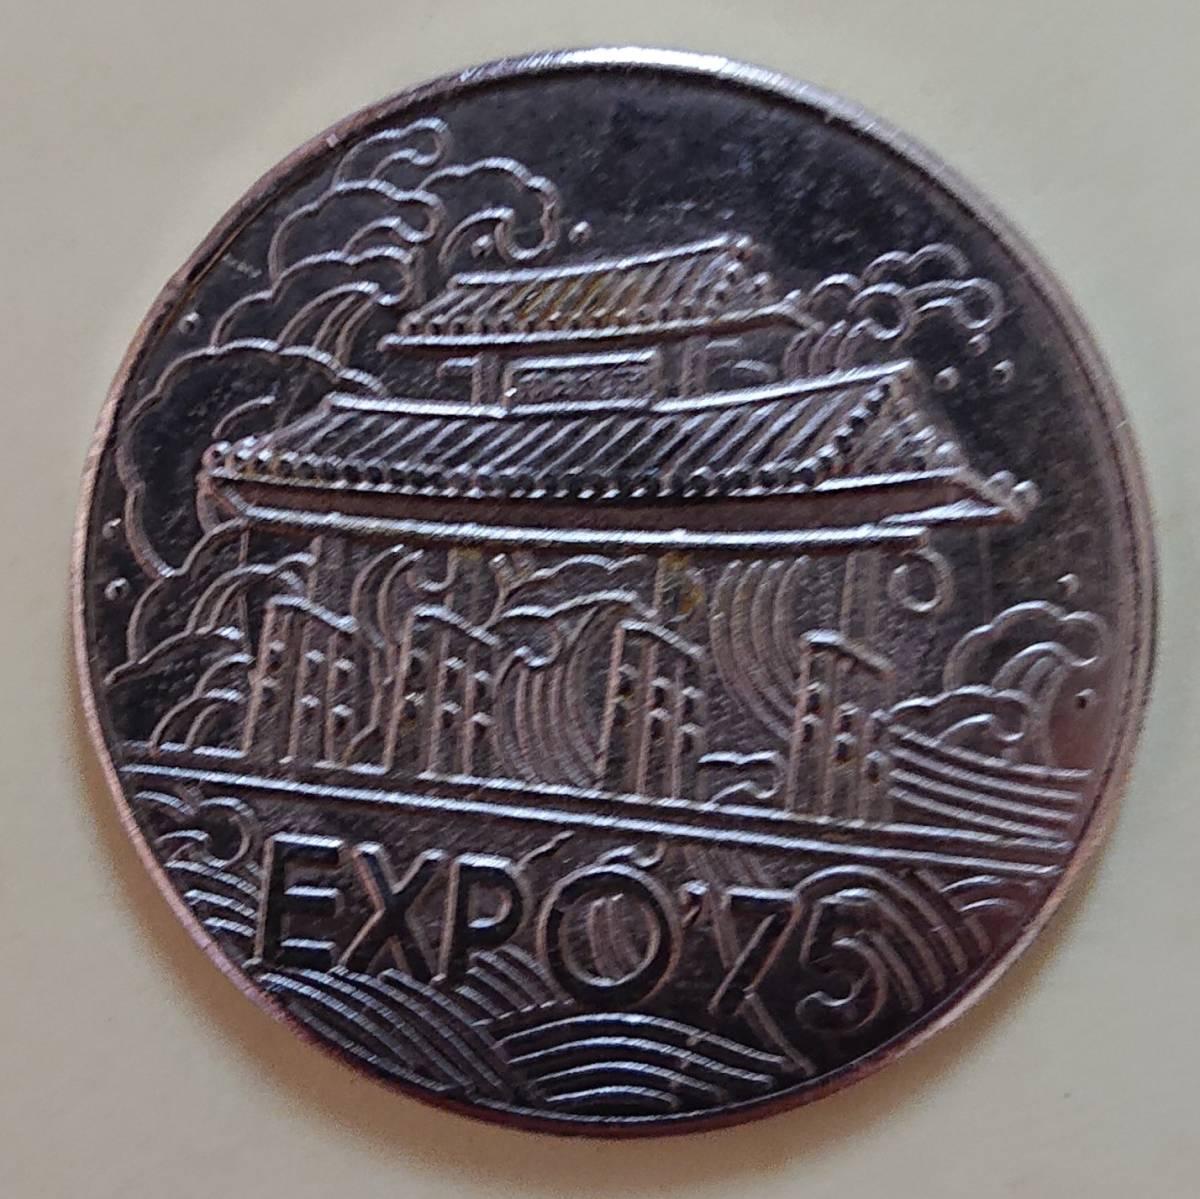 EXPO1975 沖縄国際海洋博覧会記念メダル(メダルのみ)_画像2